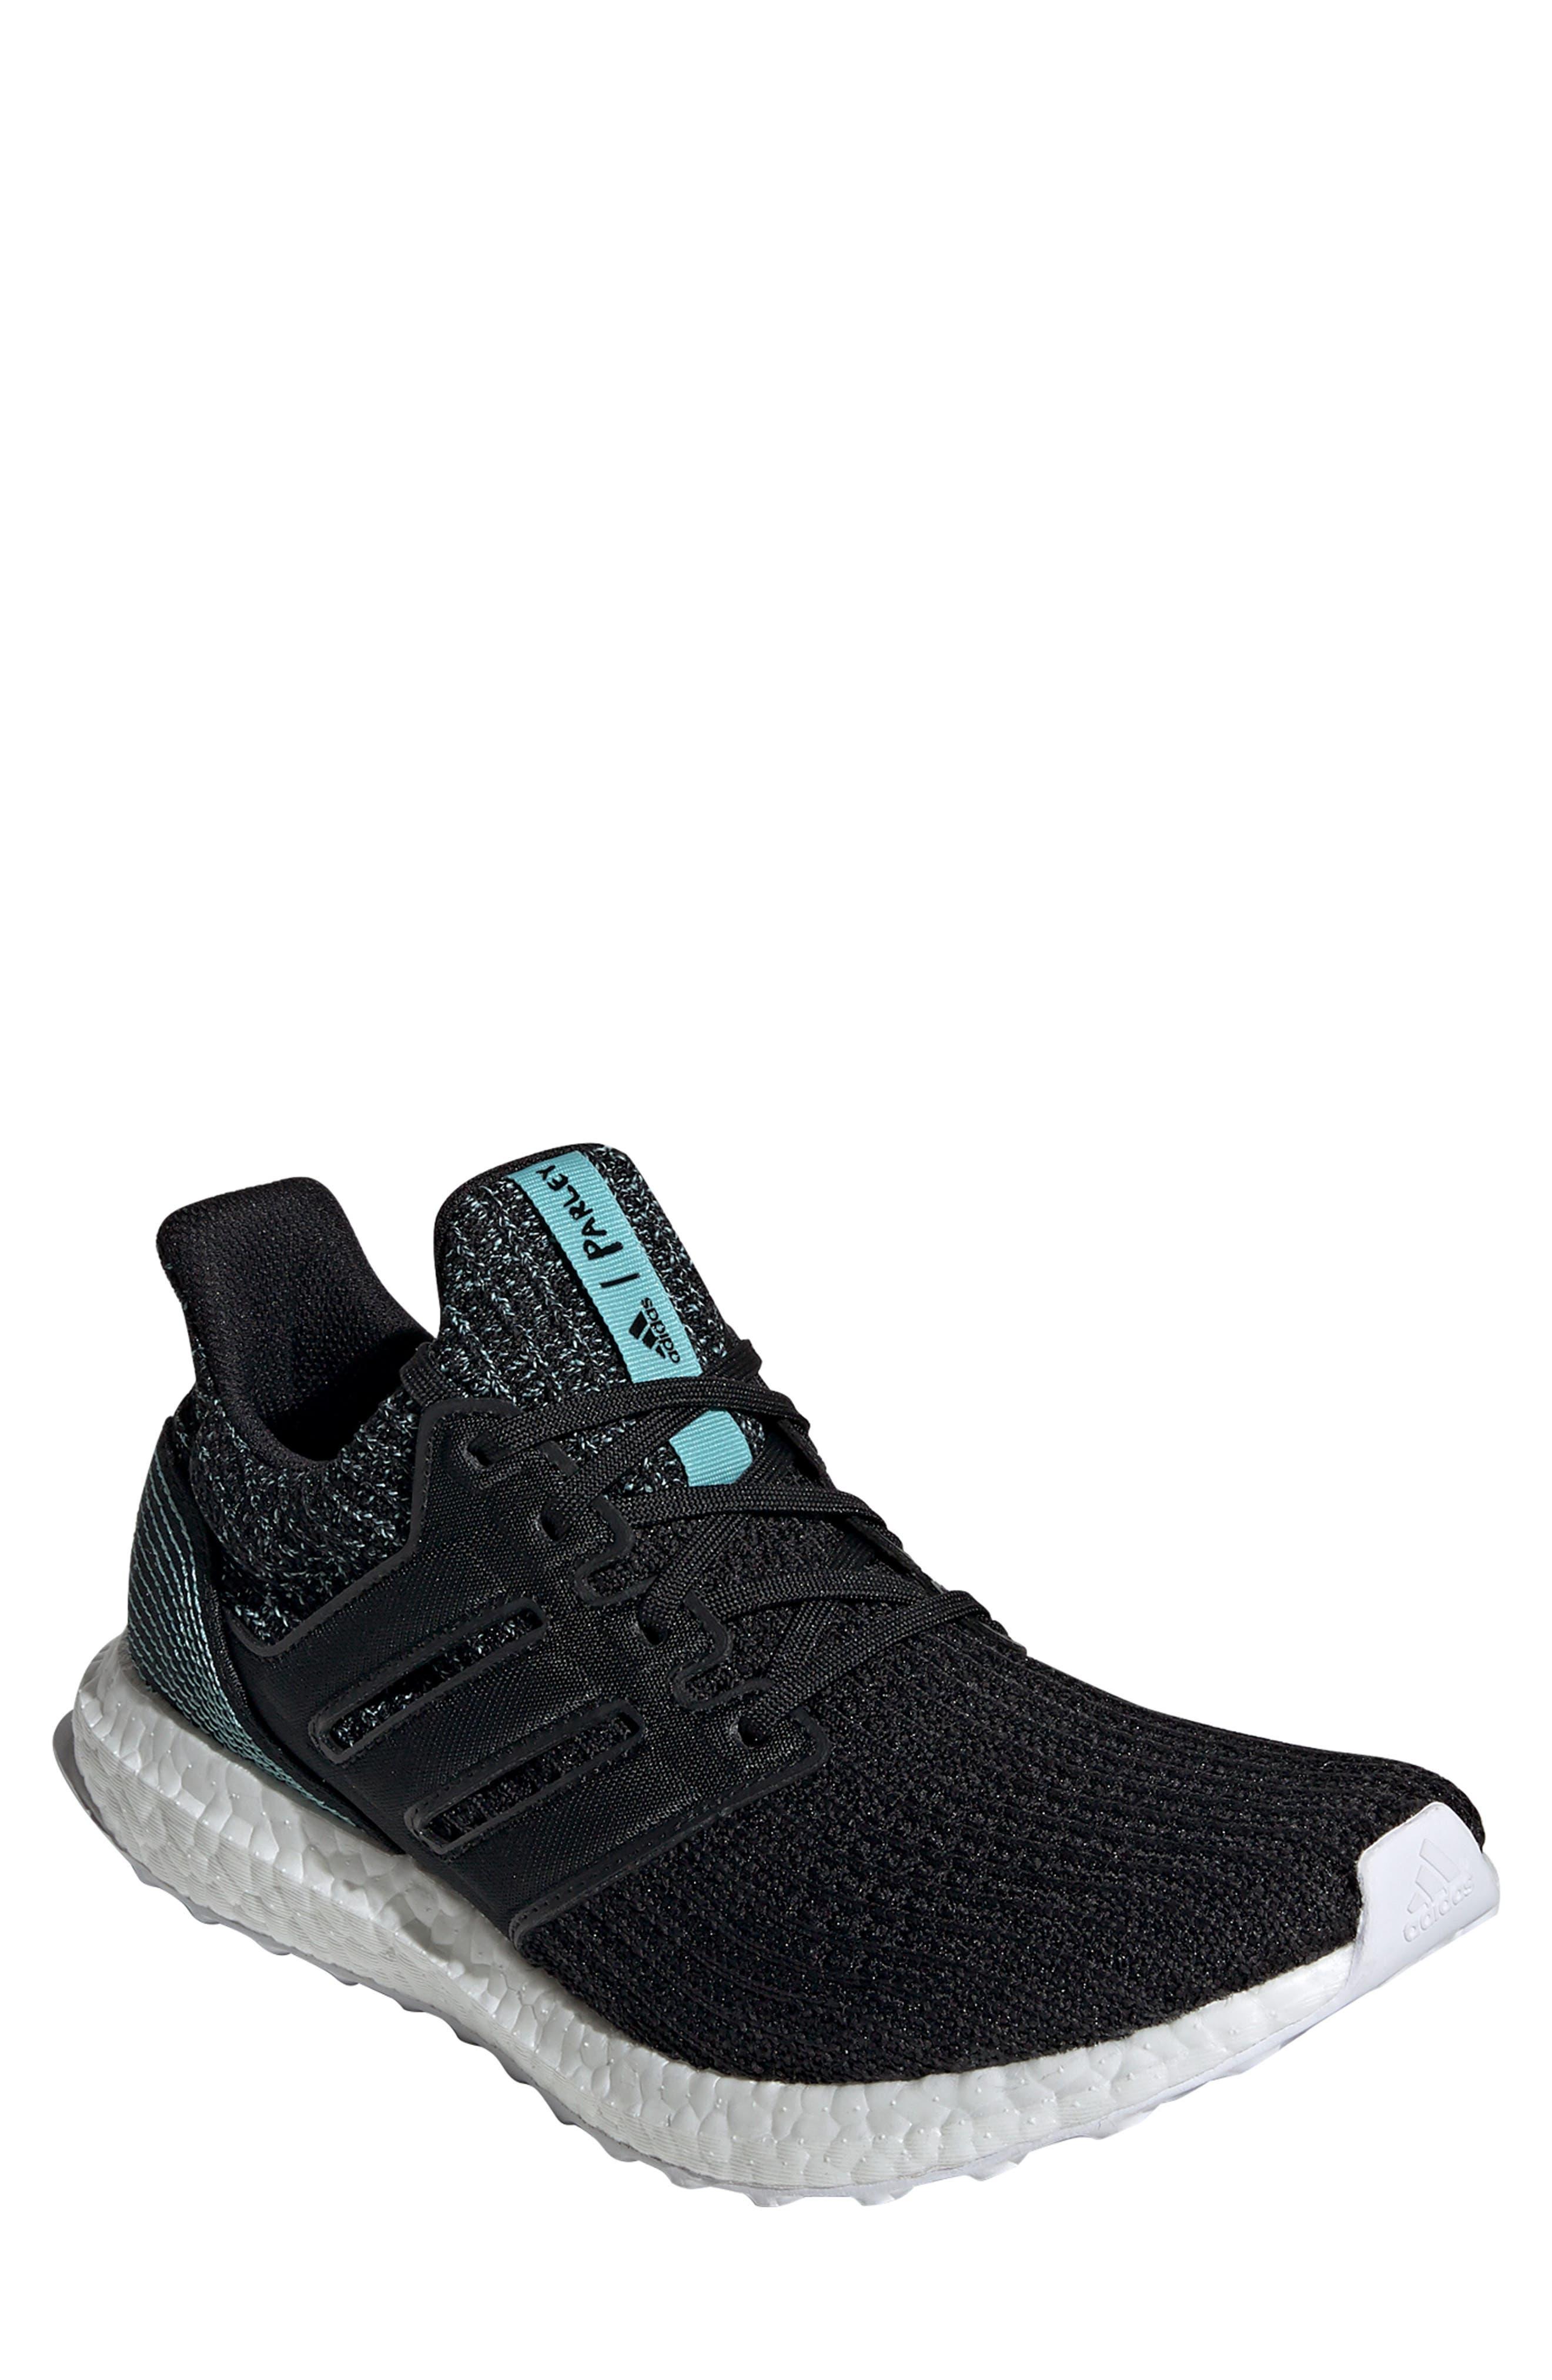 Parley UltraBoost Sneaker,                         Main,                         color, 001